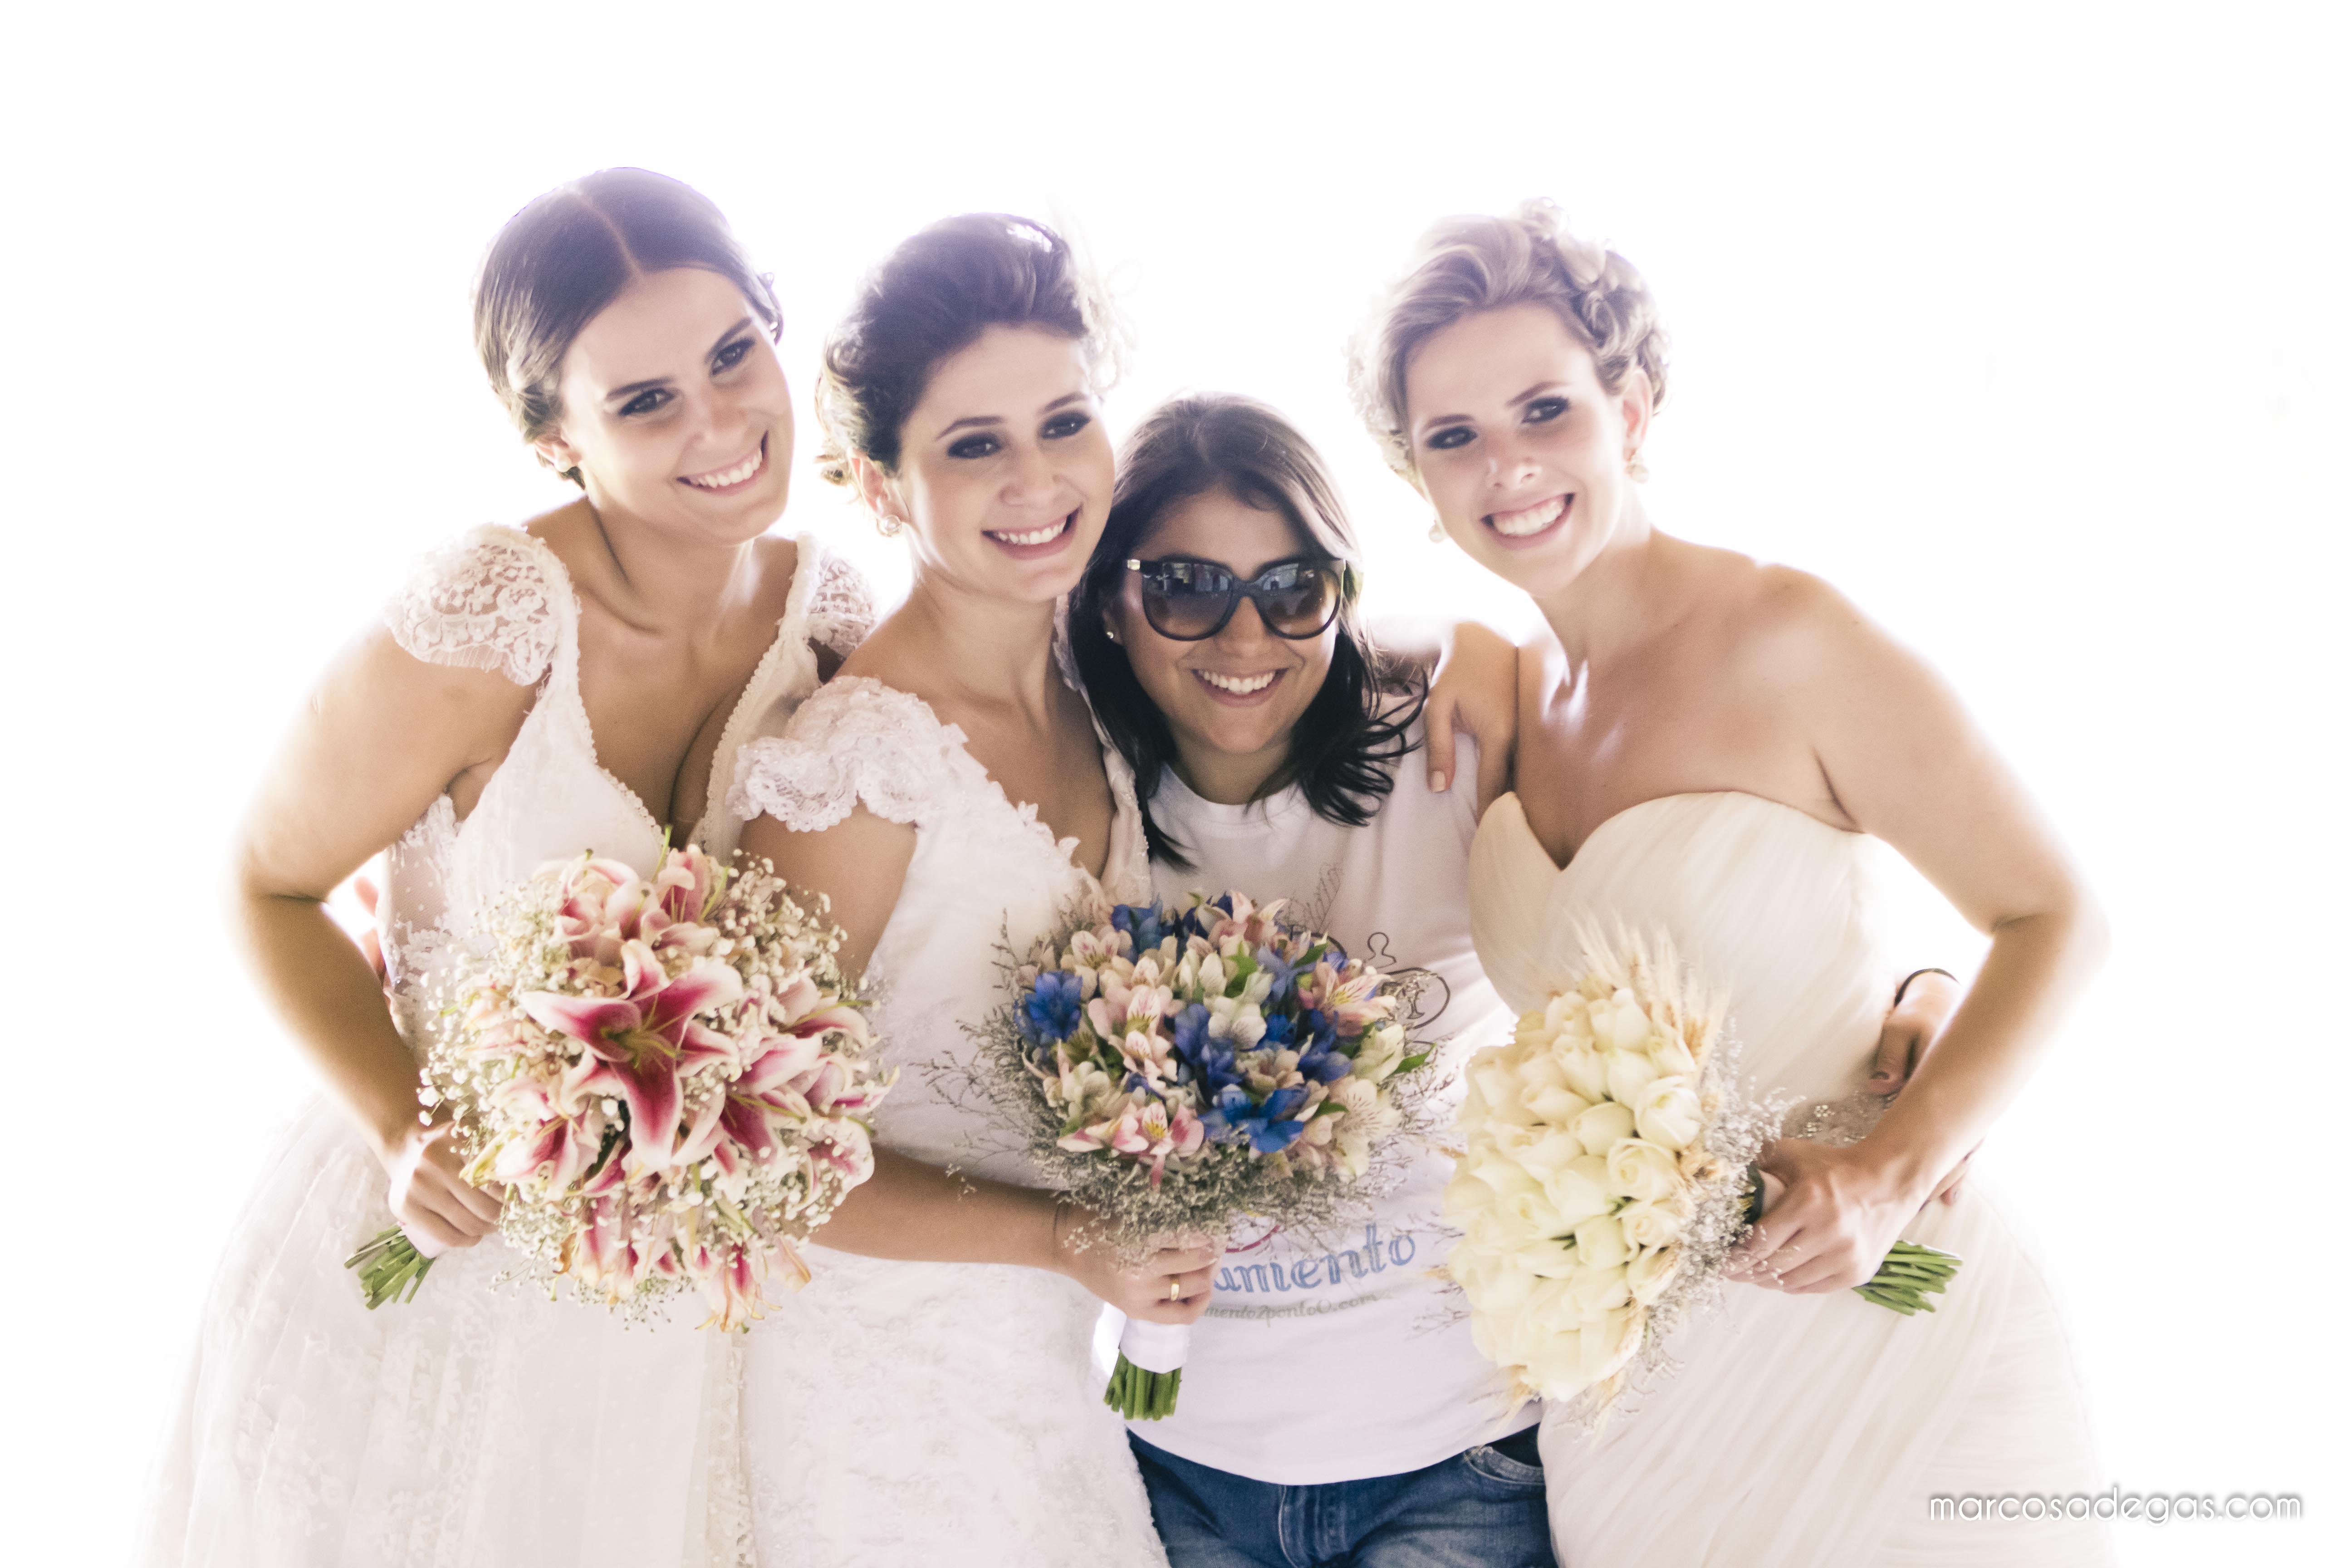 A blogueira com as noivas modelos Deborah, Cibele e Aline.